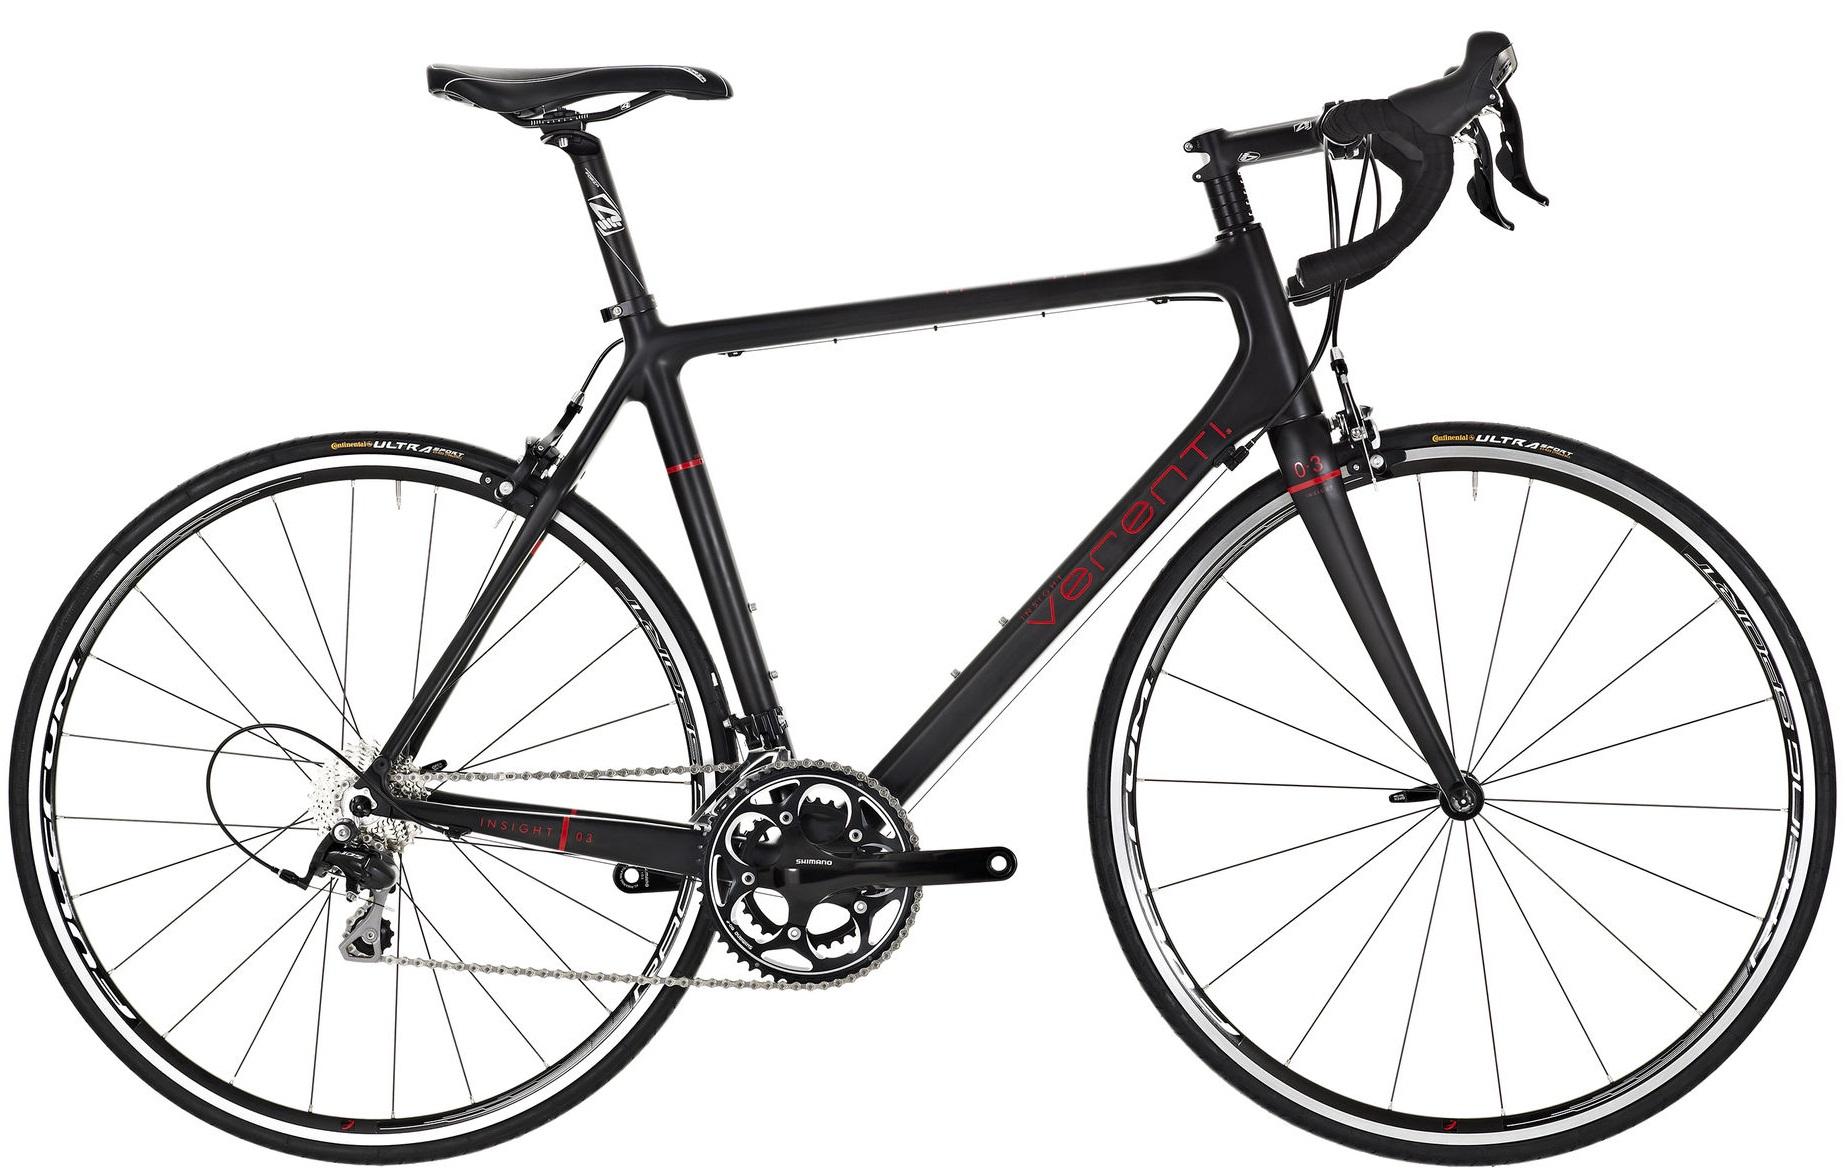 Verenti Insight 0.3 black 105 2014neuroticarnutzVerenti Insight 0.3 black 105 20142015 dedacciai gladiatore grey black red shimano 105